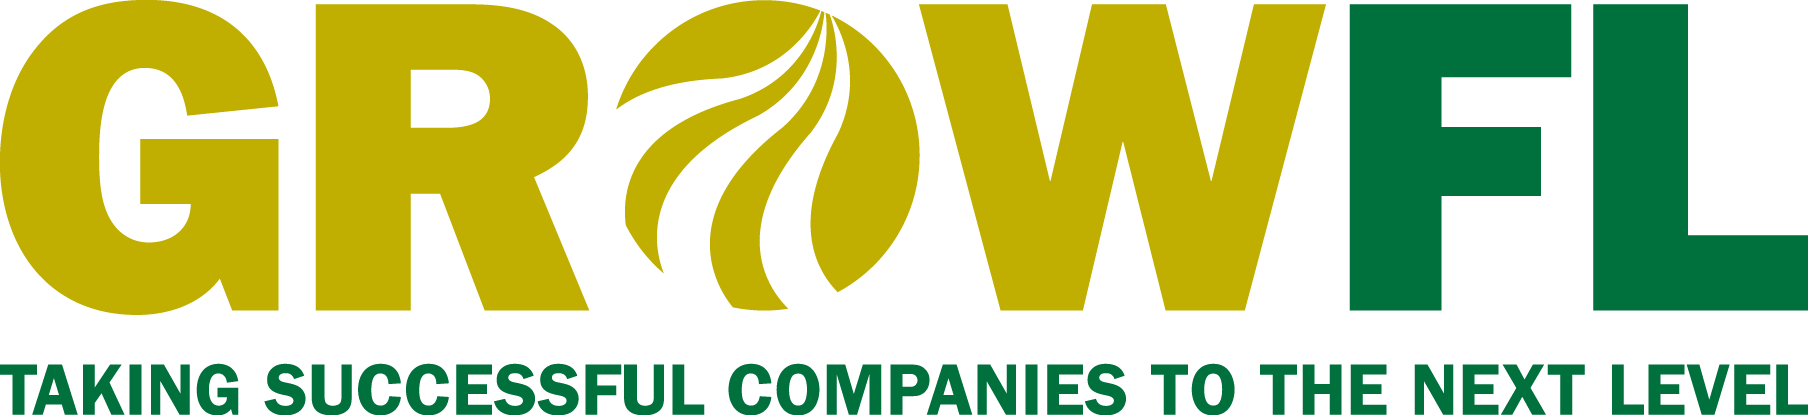 GFL Logo 2C PMS104 & 349 transp